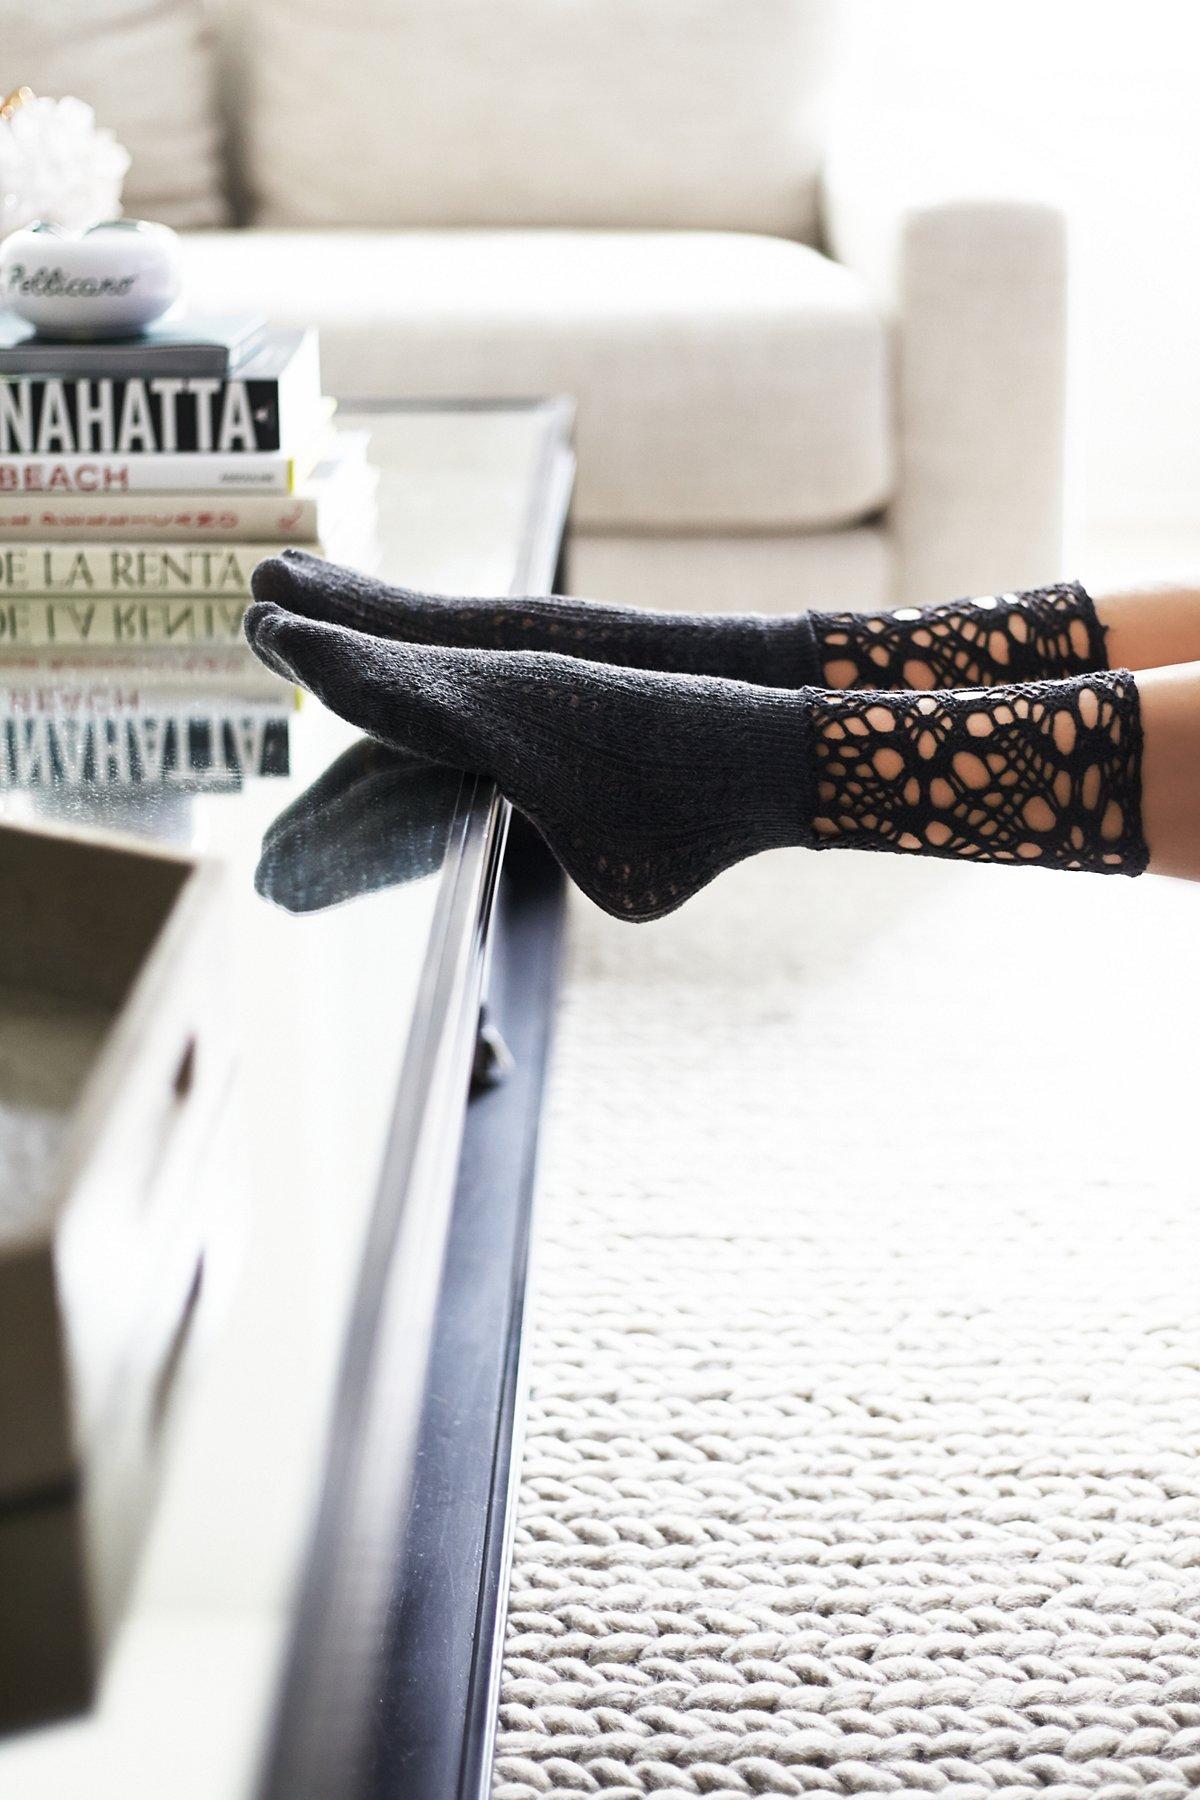 Chloe Crochet Ankle Sock